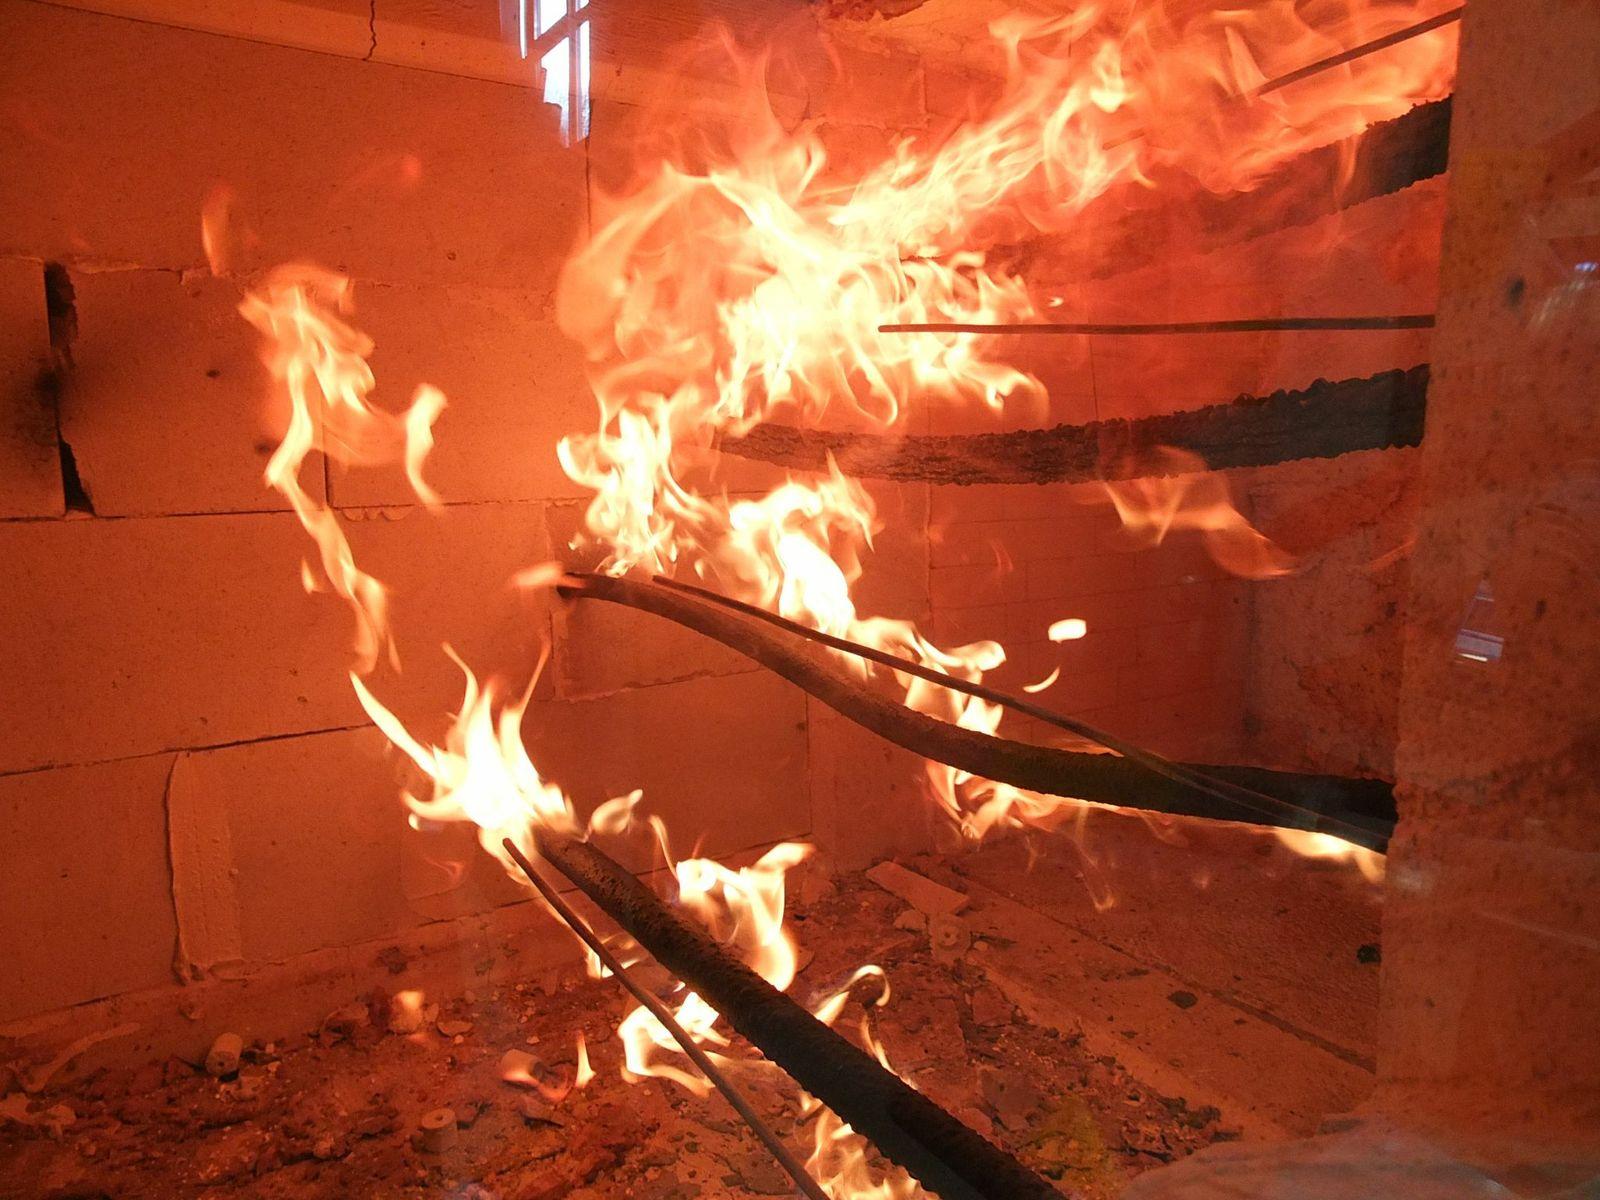 Brandsimulationen